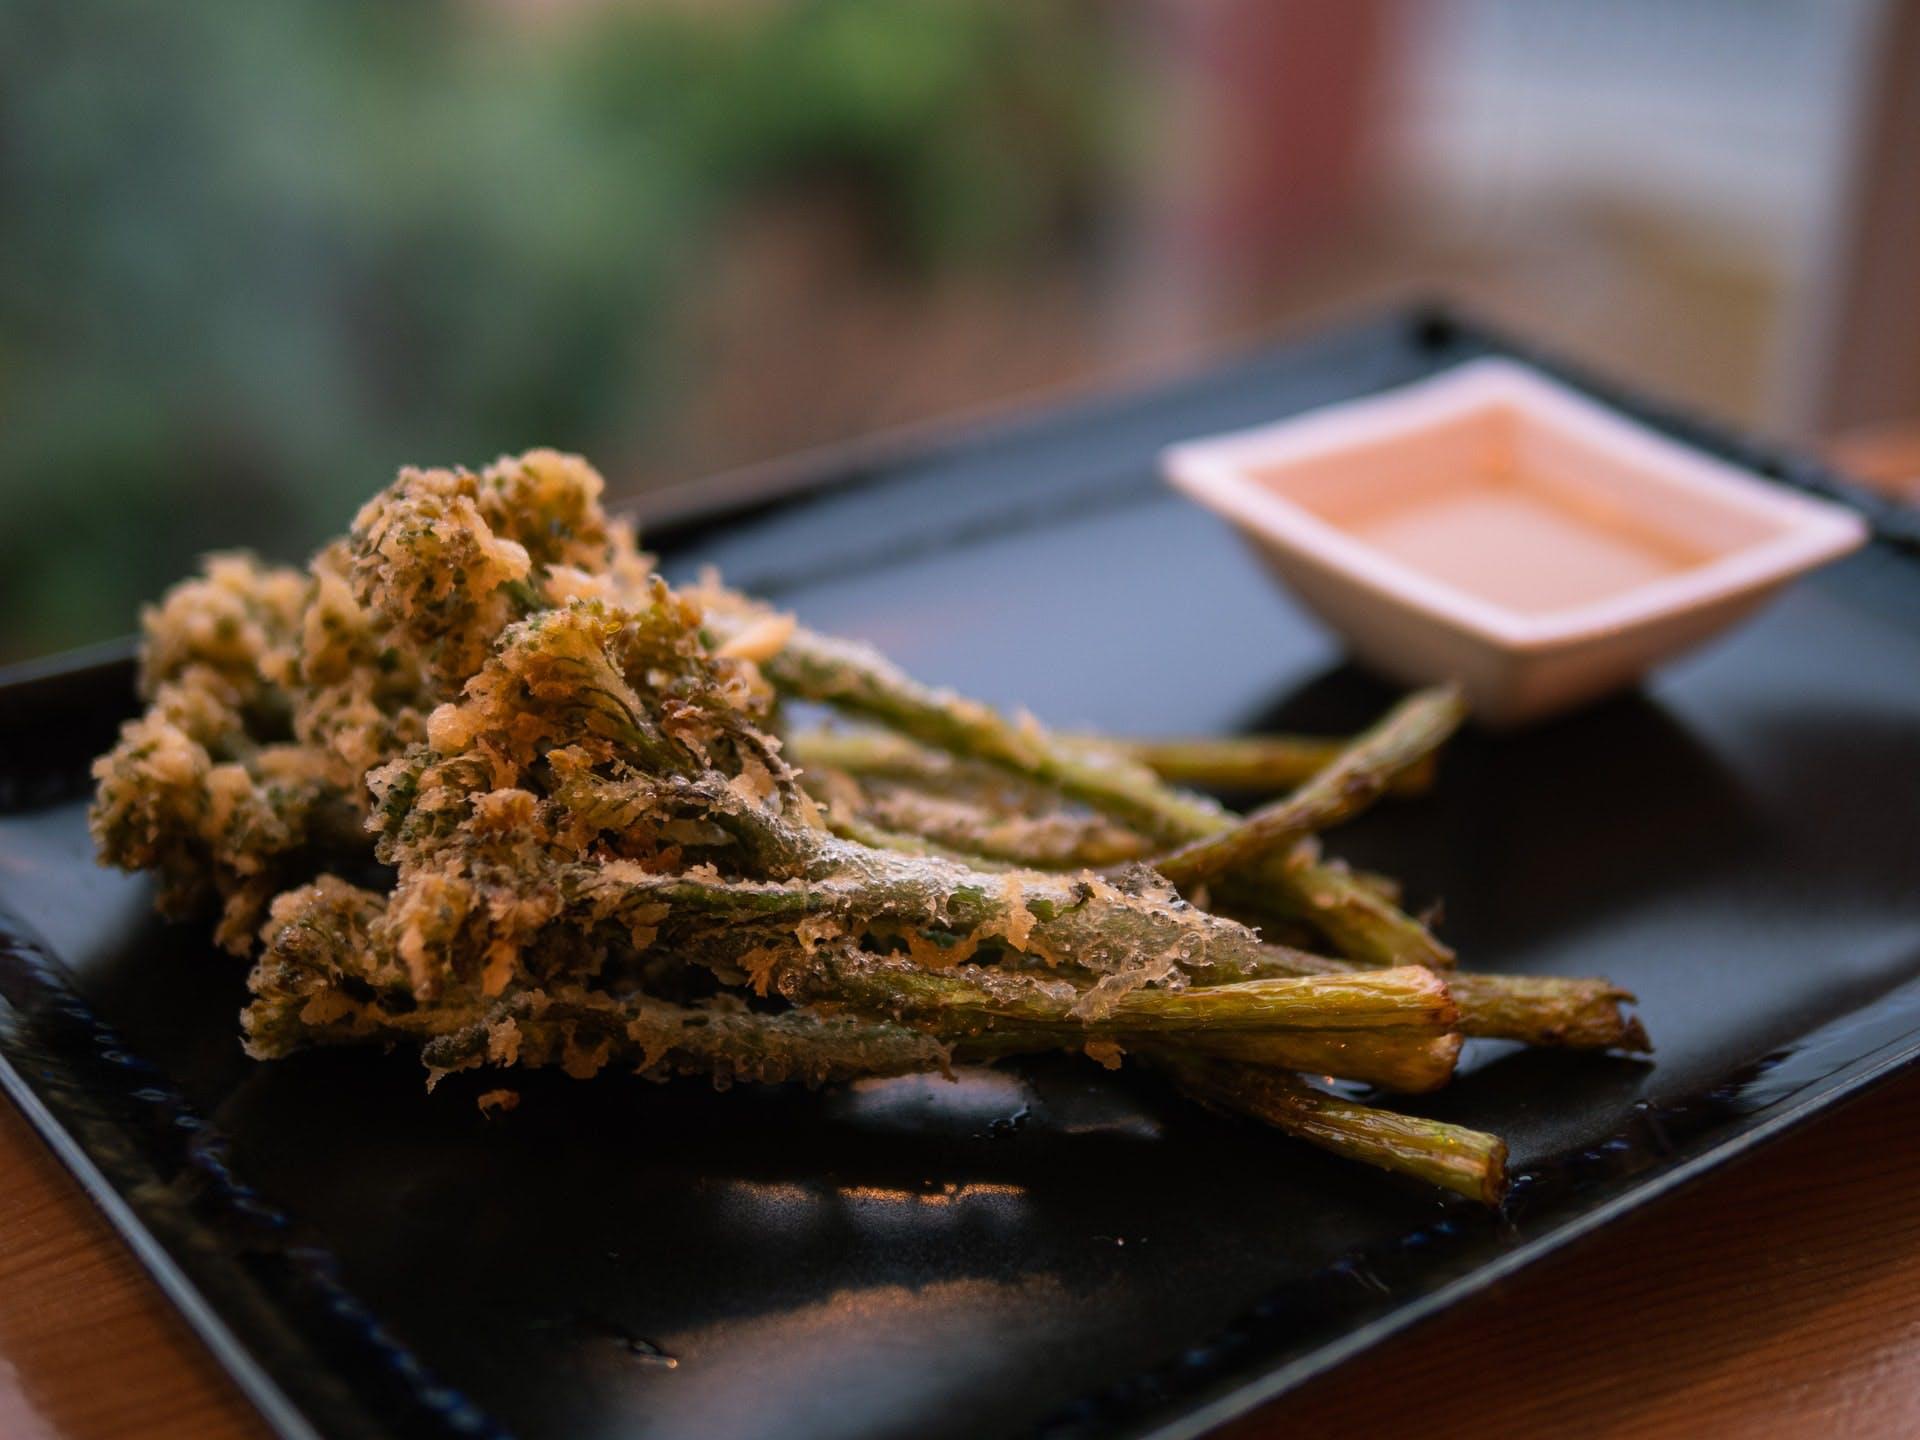 tempura broccoli on a plate